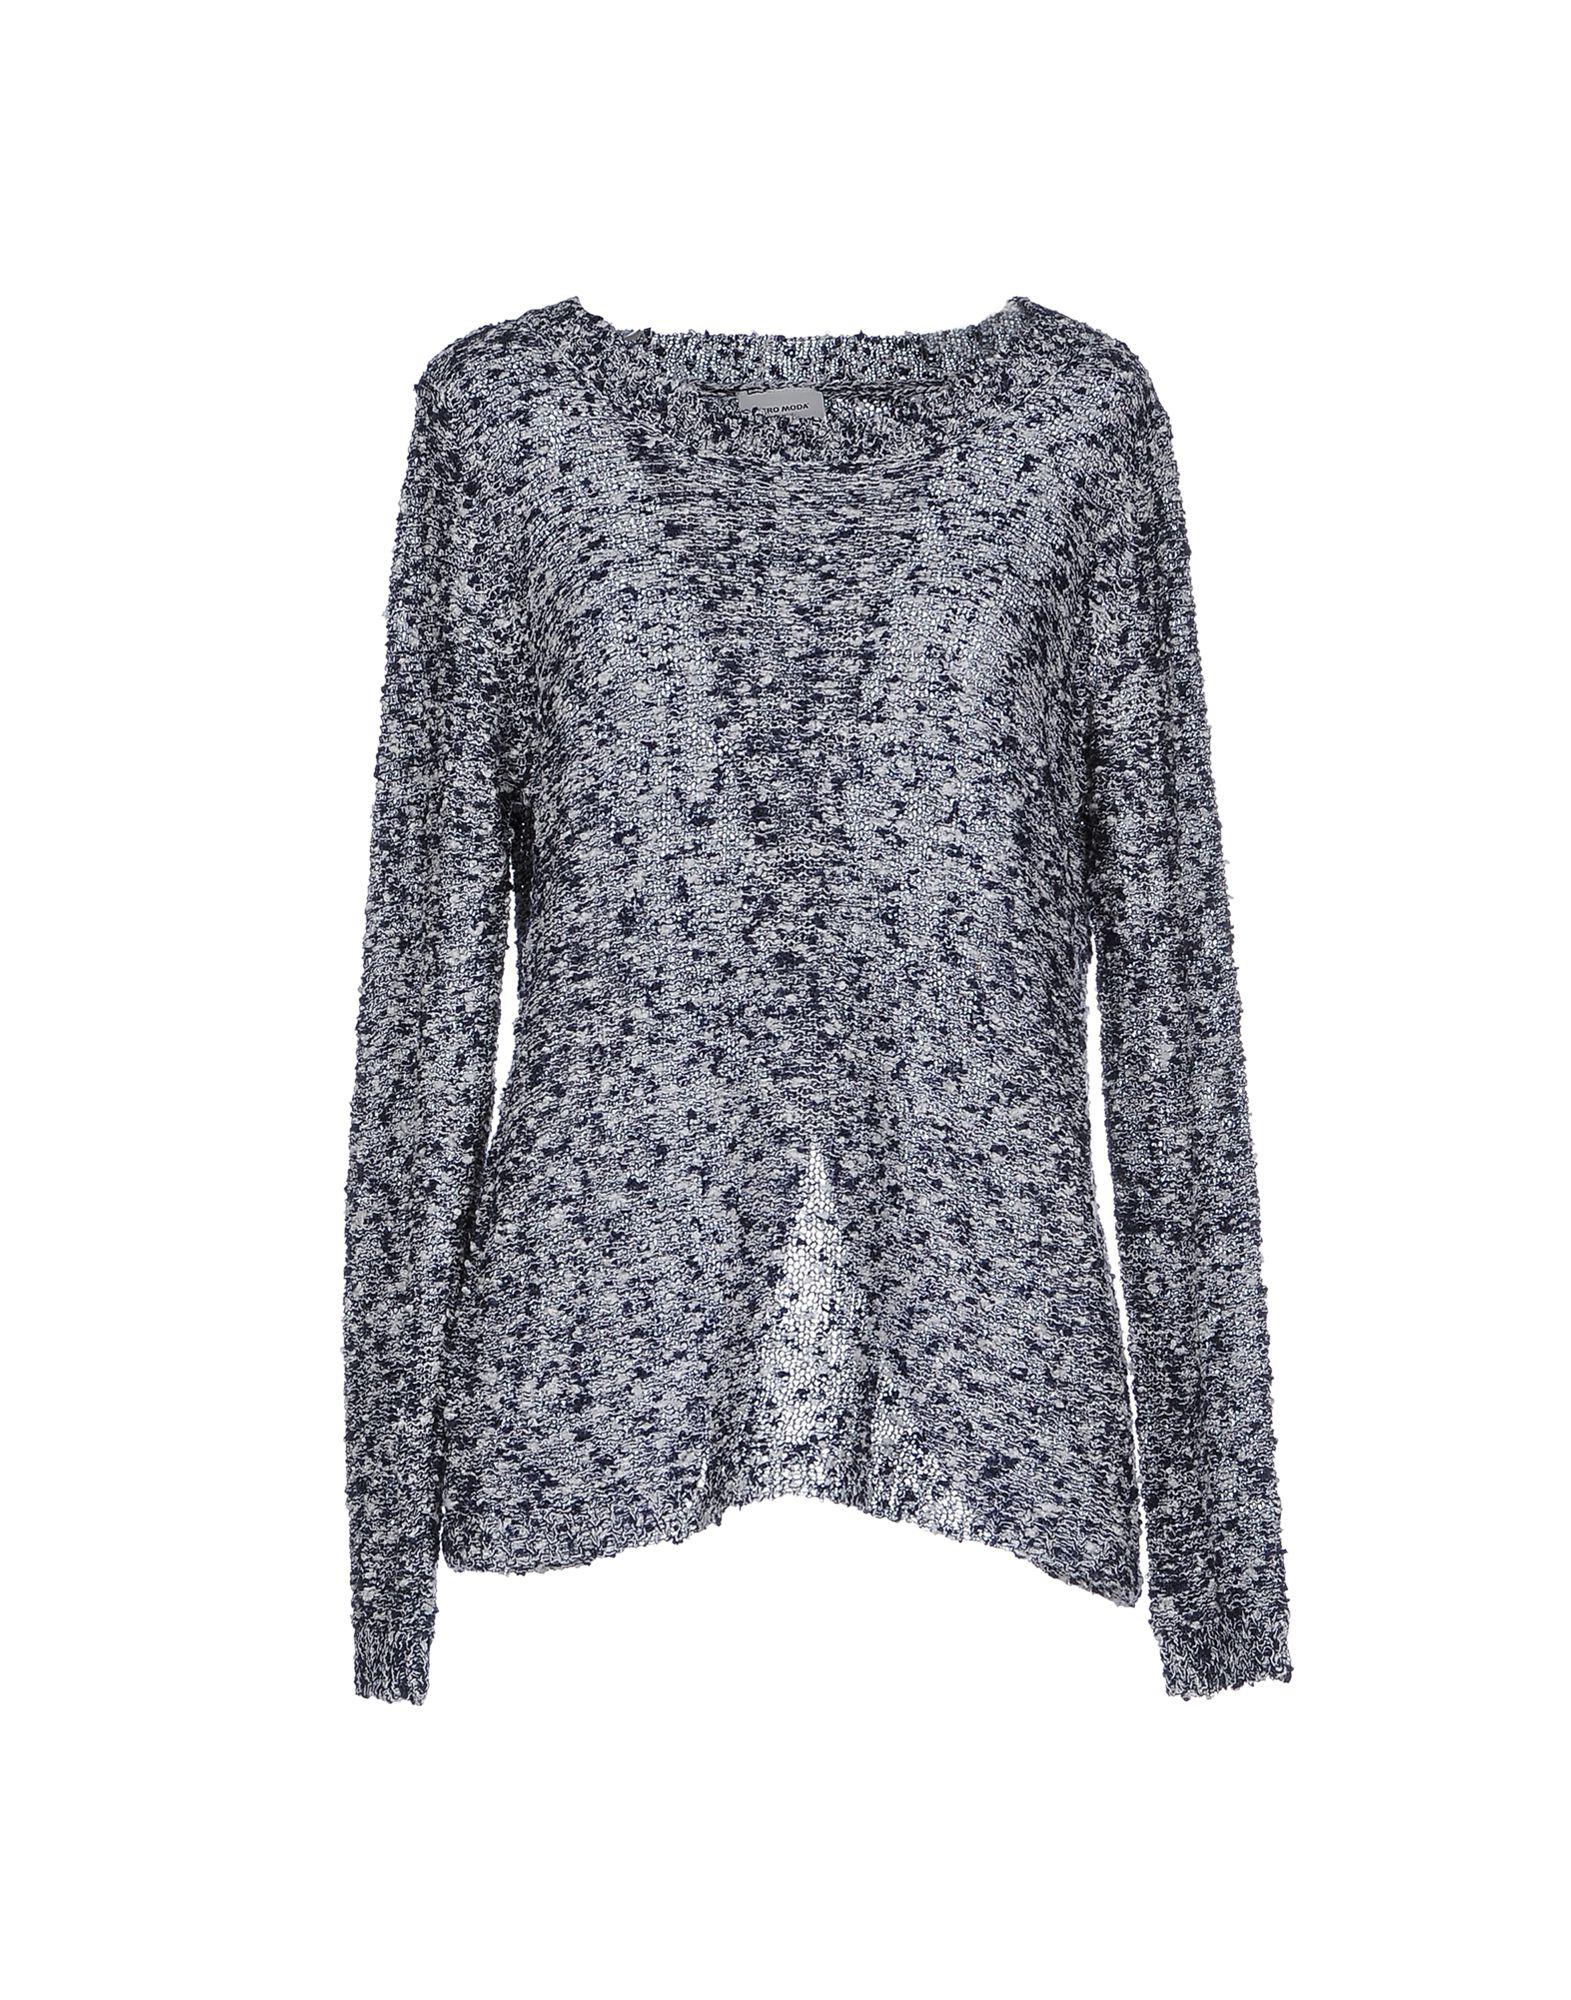 Vero Moda Knitting Patterns : Vero moda sweater in blue lyst